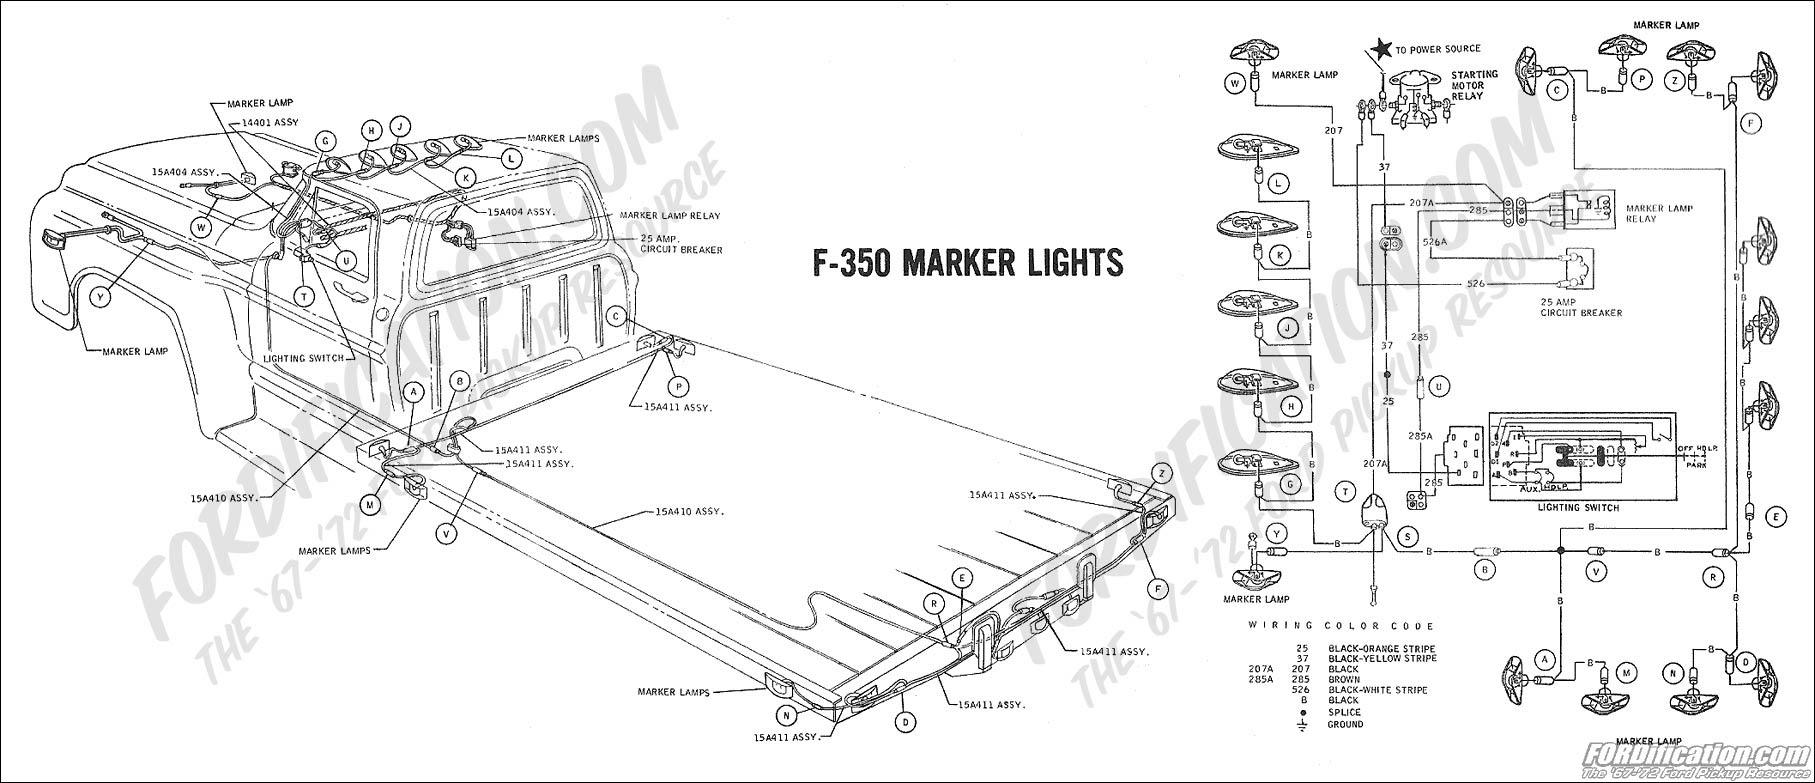 1969 Gmc Truck Wiring Diagram Gota Wiring Diagram